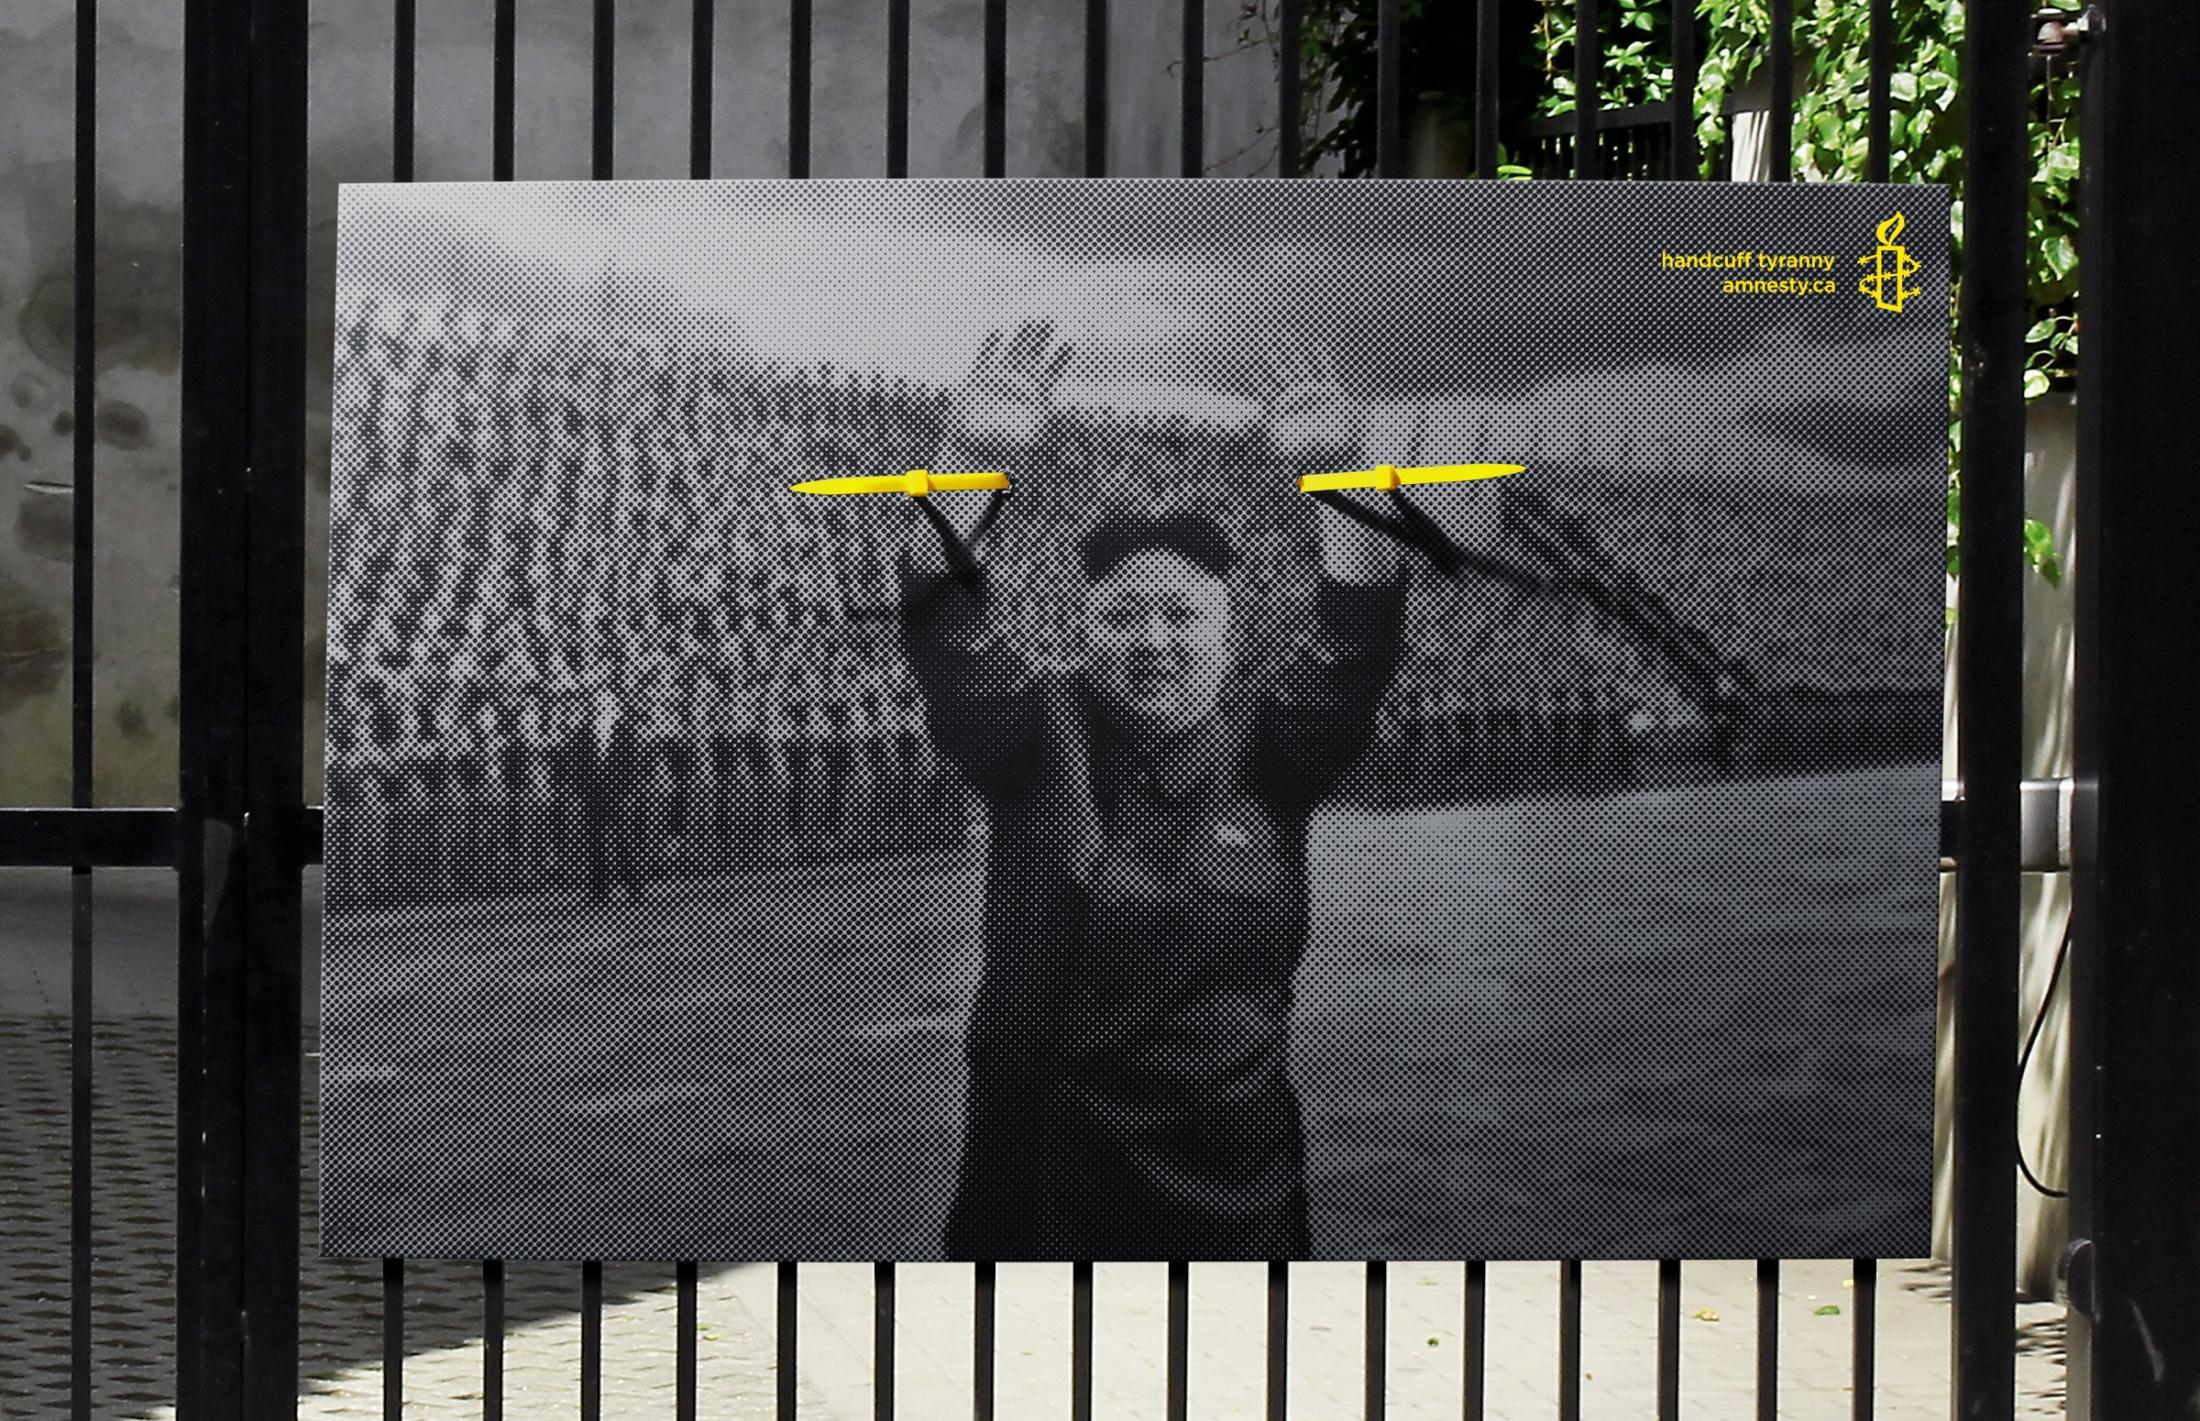 Amnesty International Outdoor Ad -  Handcuff tyranny, 1